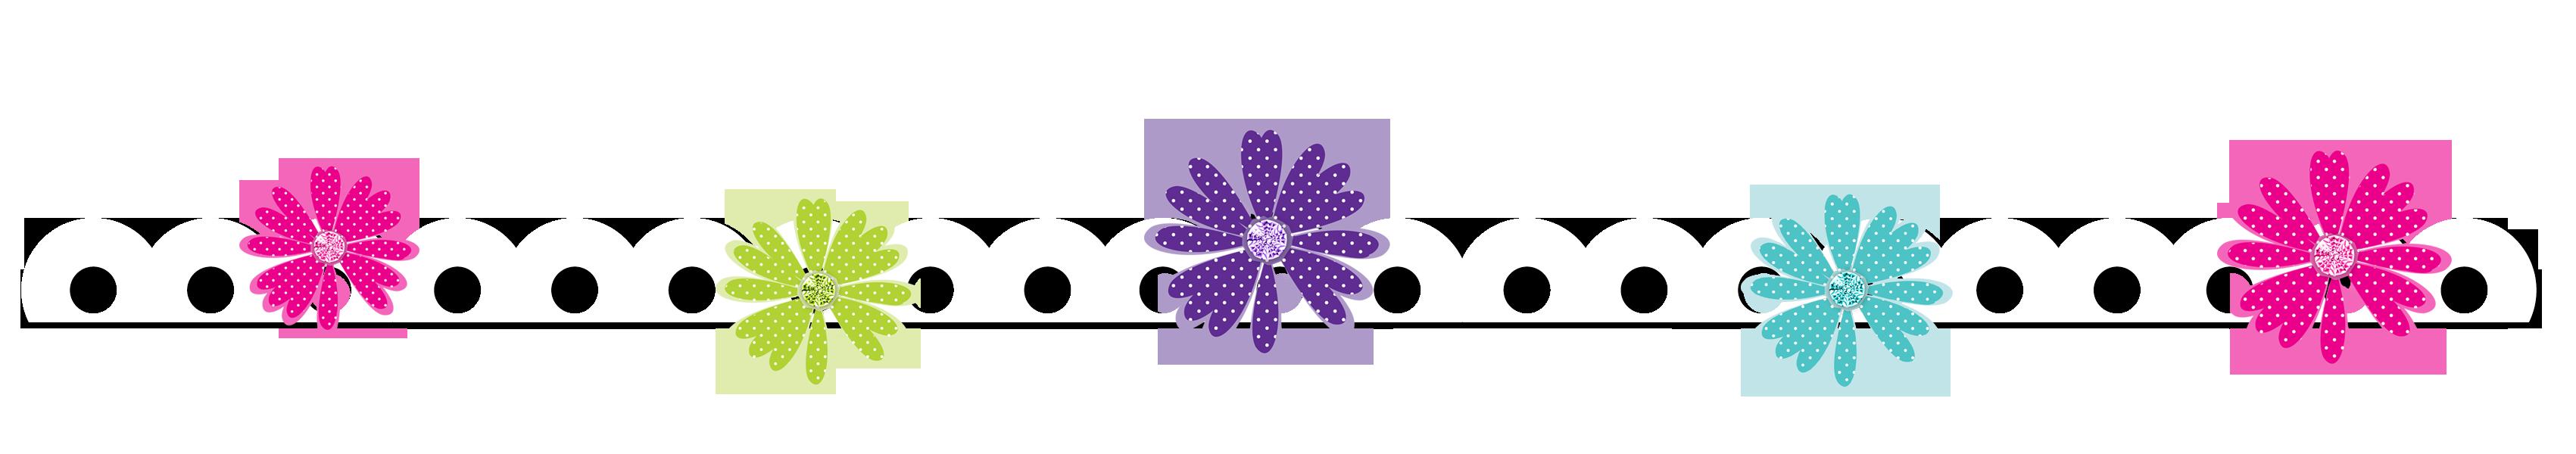 Flower row clipart jpg transparent download Row Of Flowers Clip Art - ClipArt Best jpg transparent download